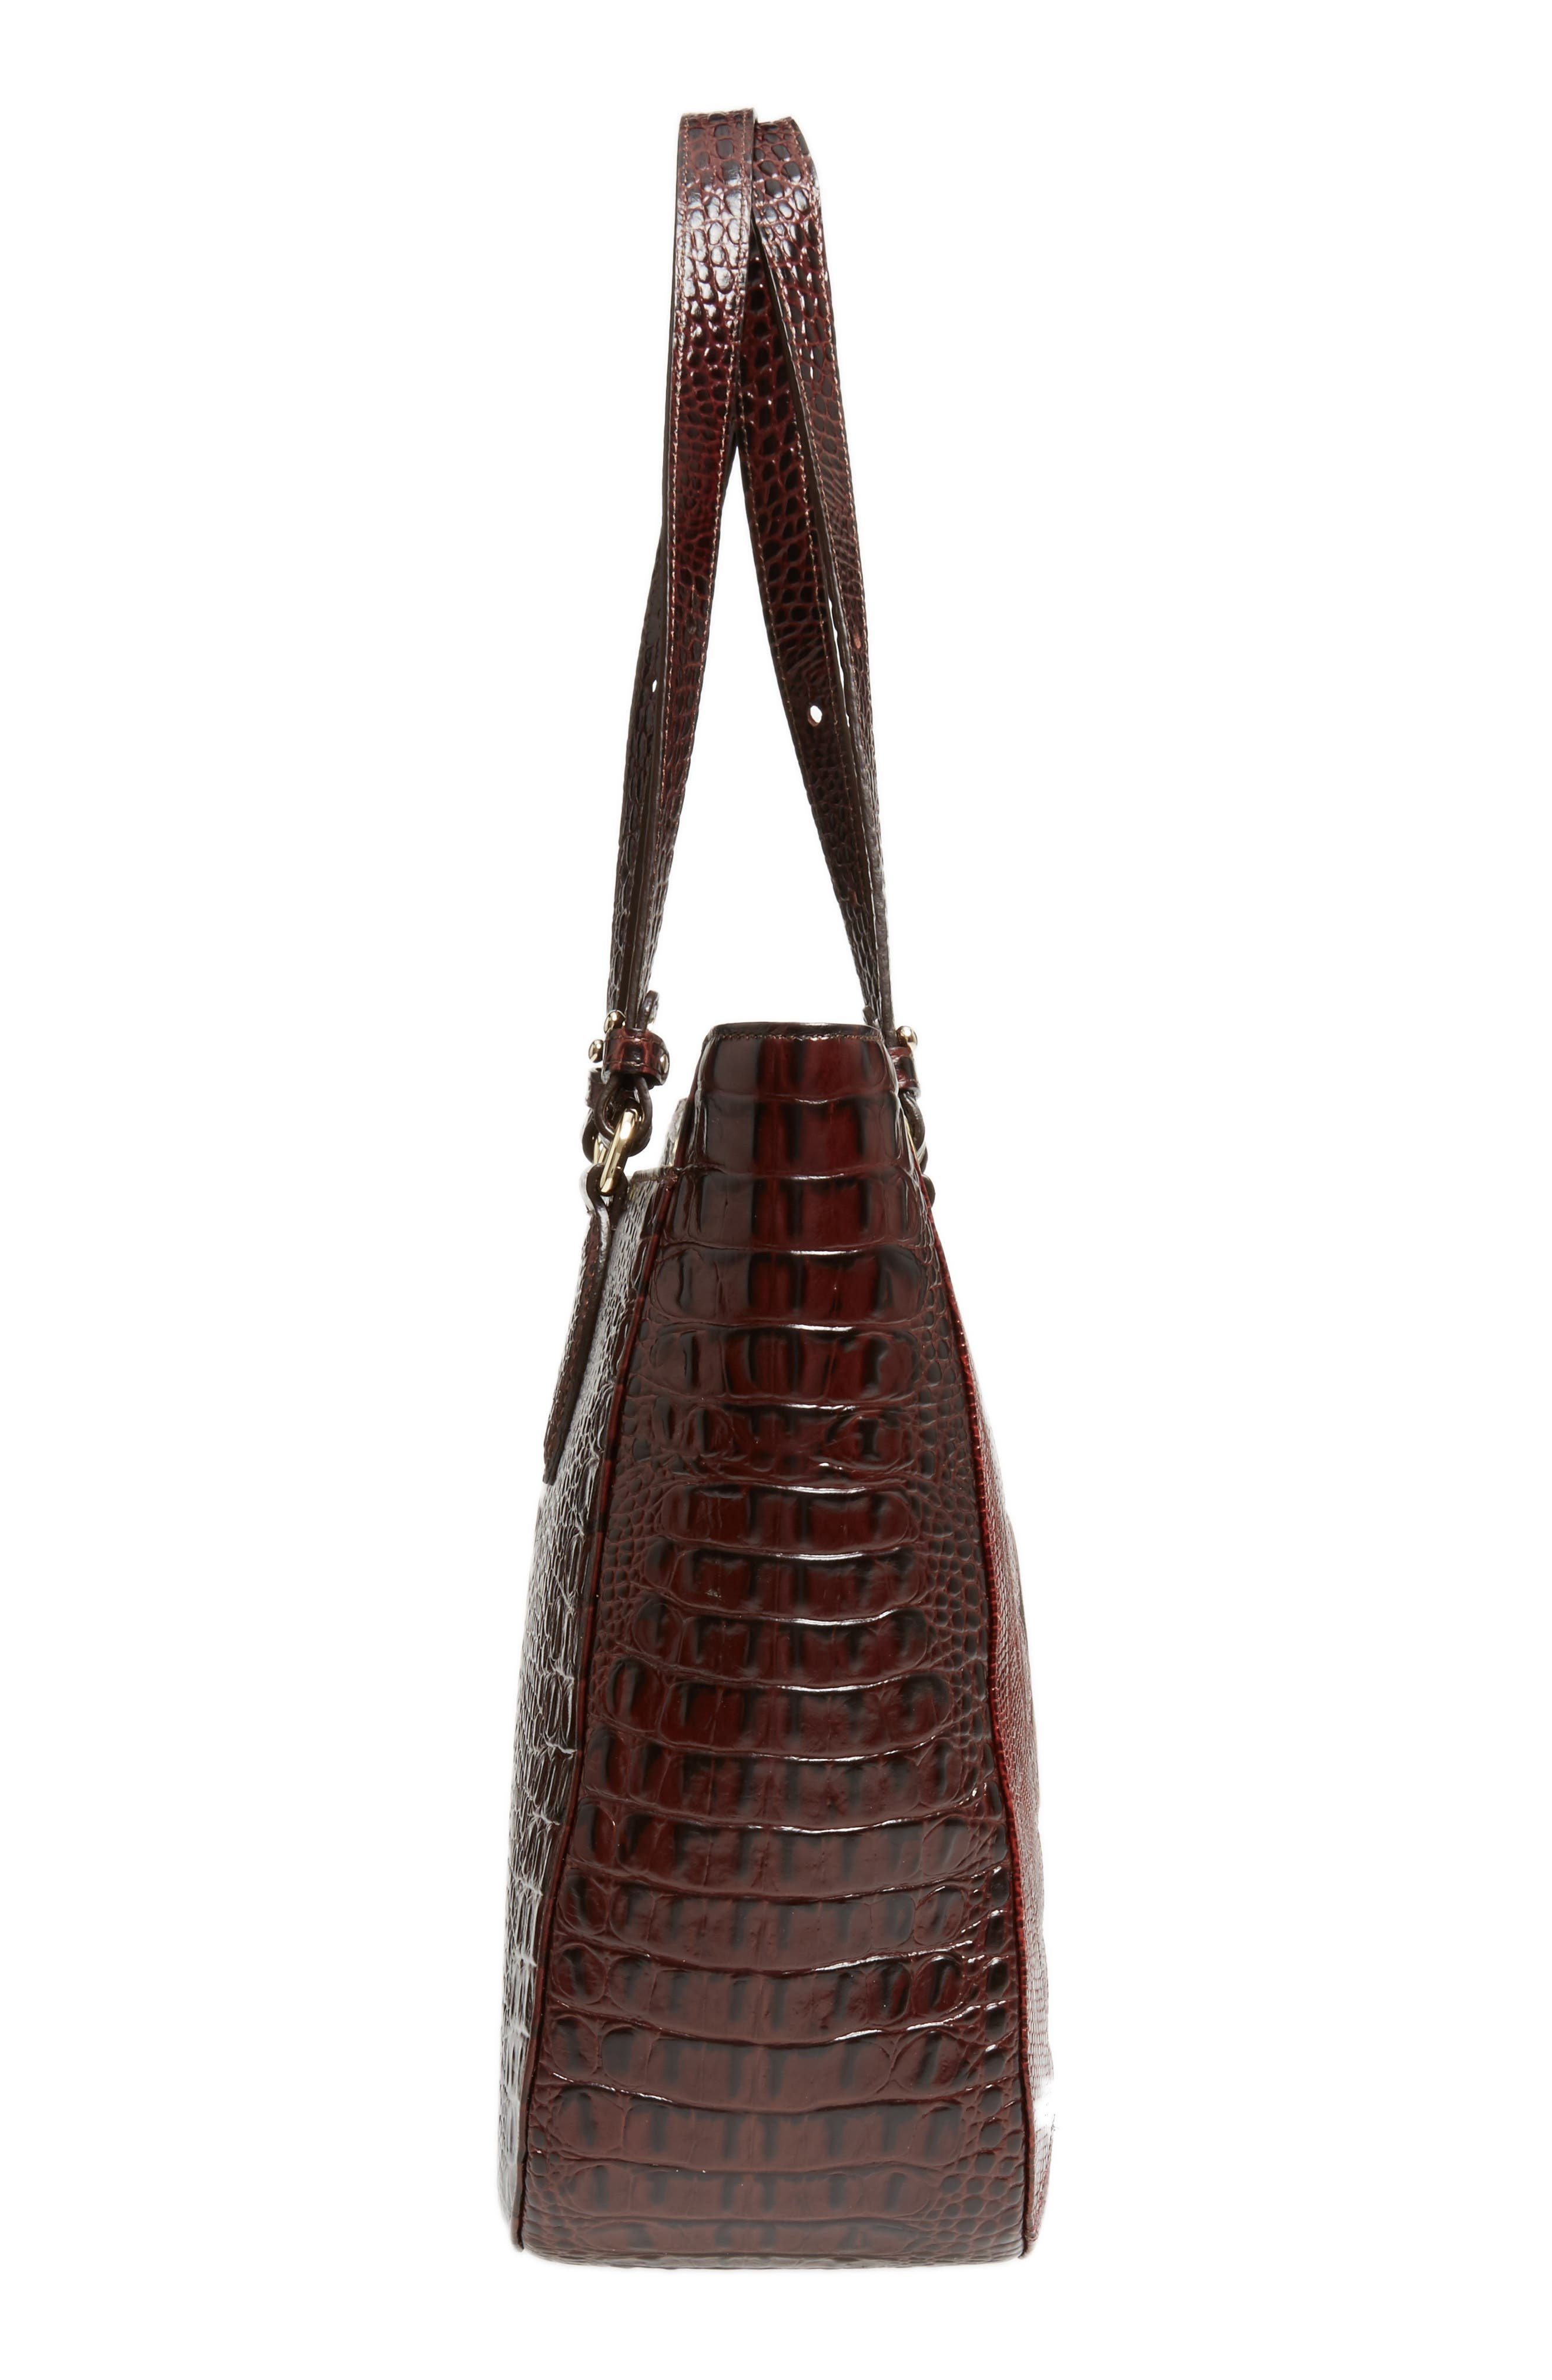 Medium Red Verona - Lena Leather Tote,                             Alternate thumbnail 5, color,                             610